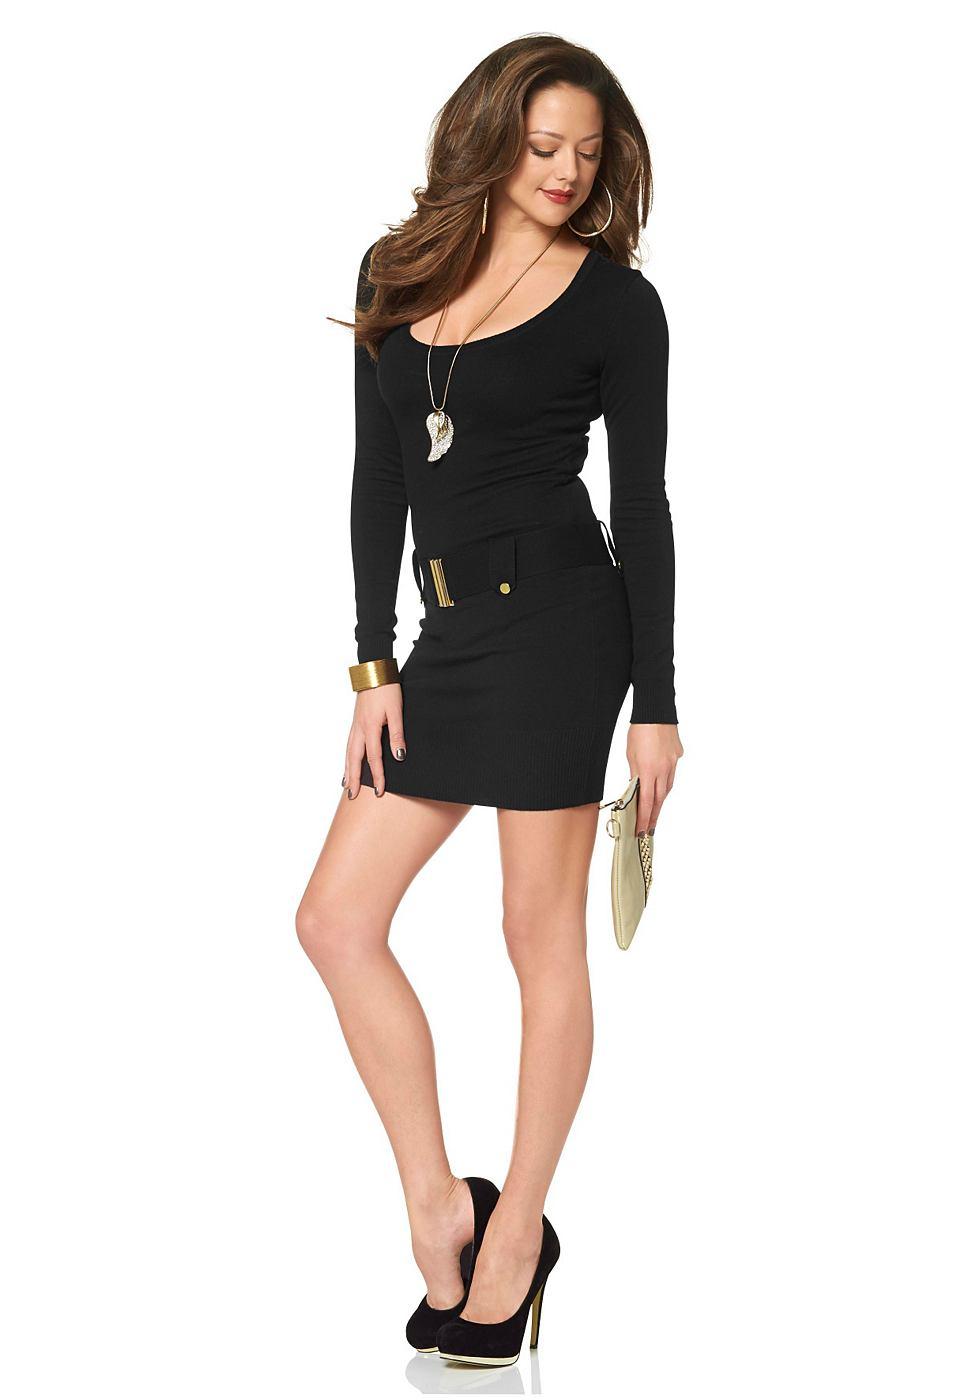 Melrose Tricot-jurk met wijde ronde hals zwart